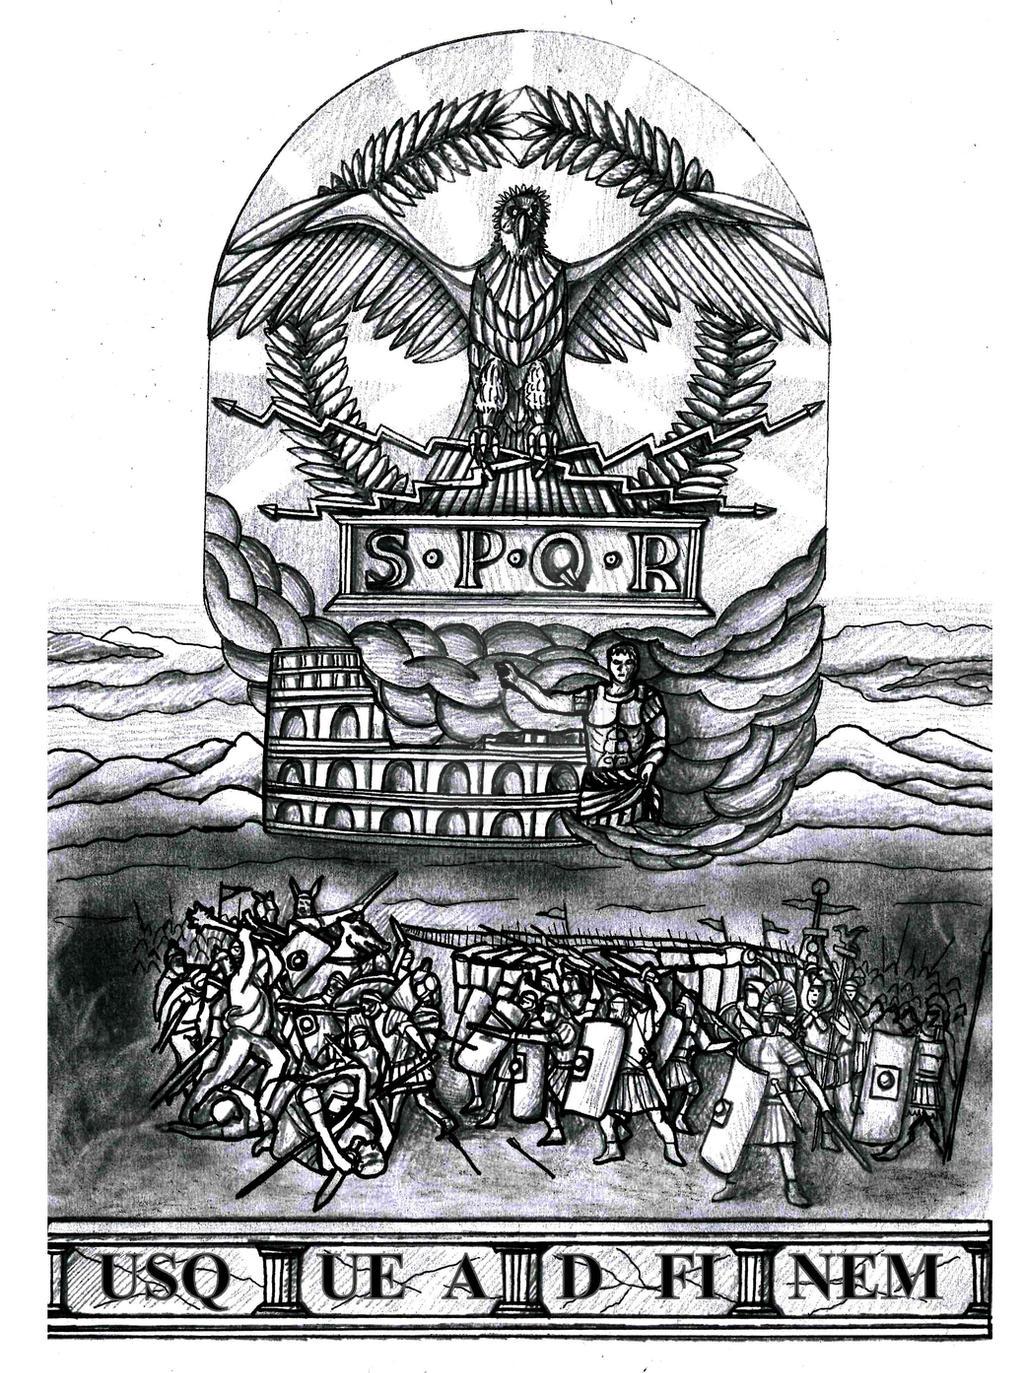 When Did The Spqr Tattoos Originate: SPQR Roman Empire Half Sleeve Tattoo By Thehoundofulster